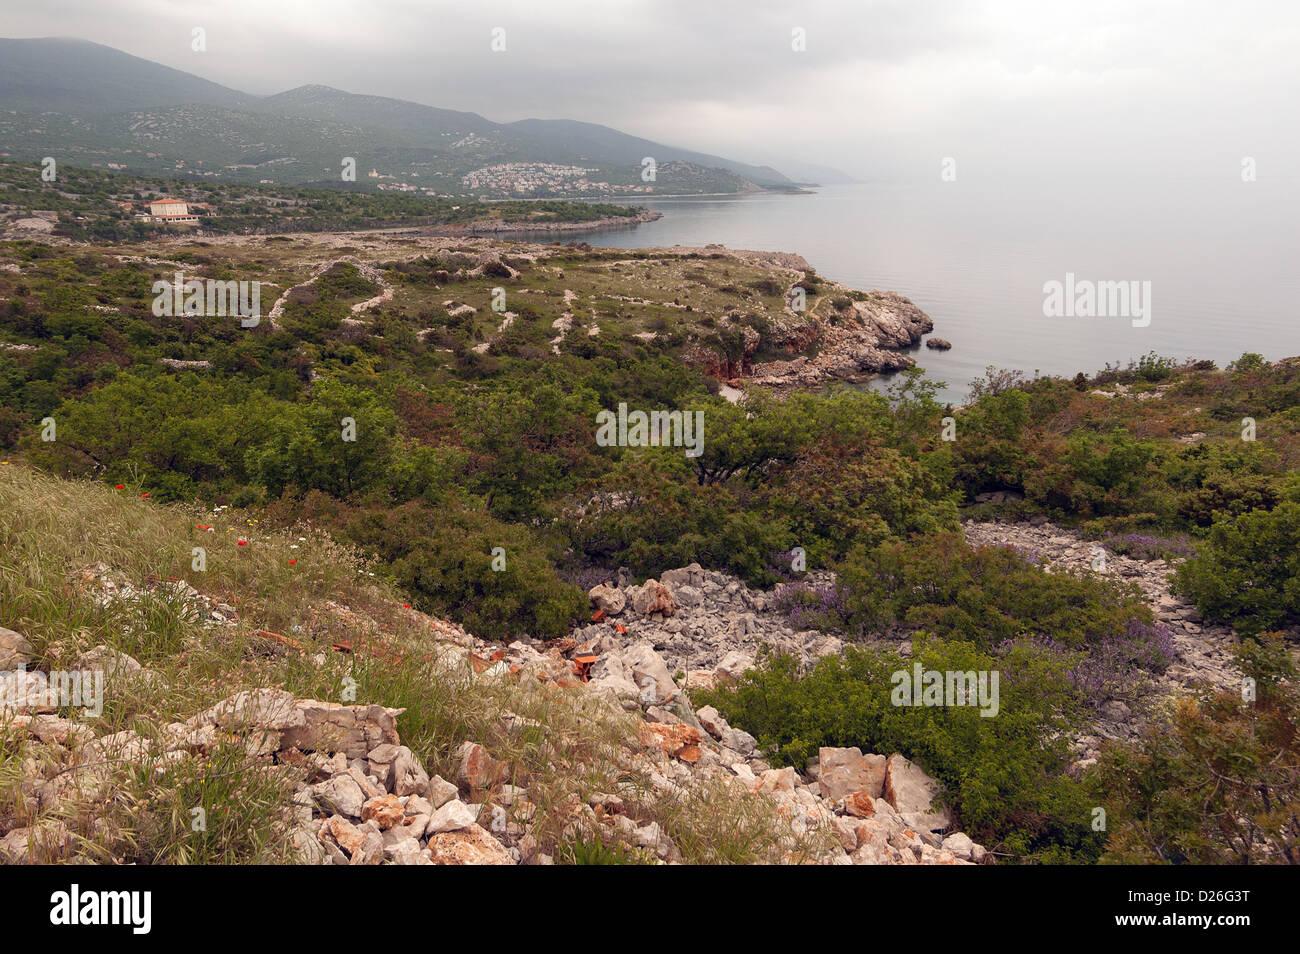 Elk192-2002 Croatia, Zadar, Dalmatian Coast landscape - Stock Image